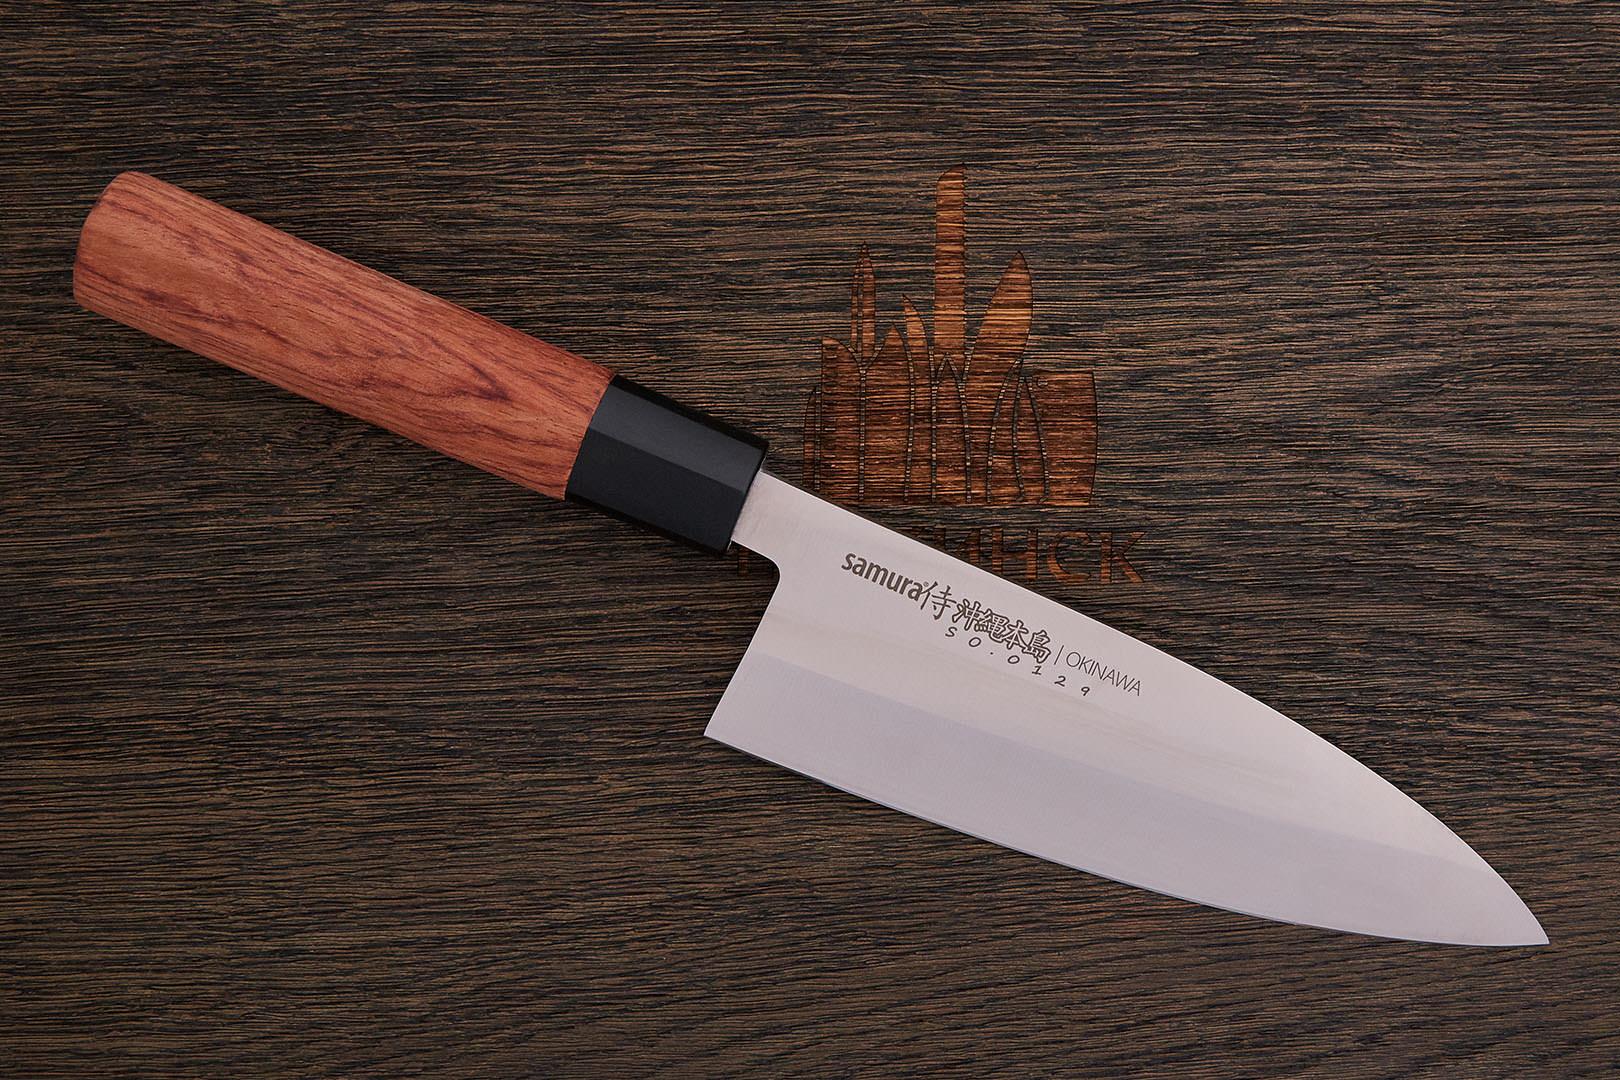 нож деба японский